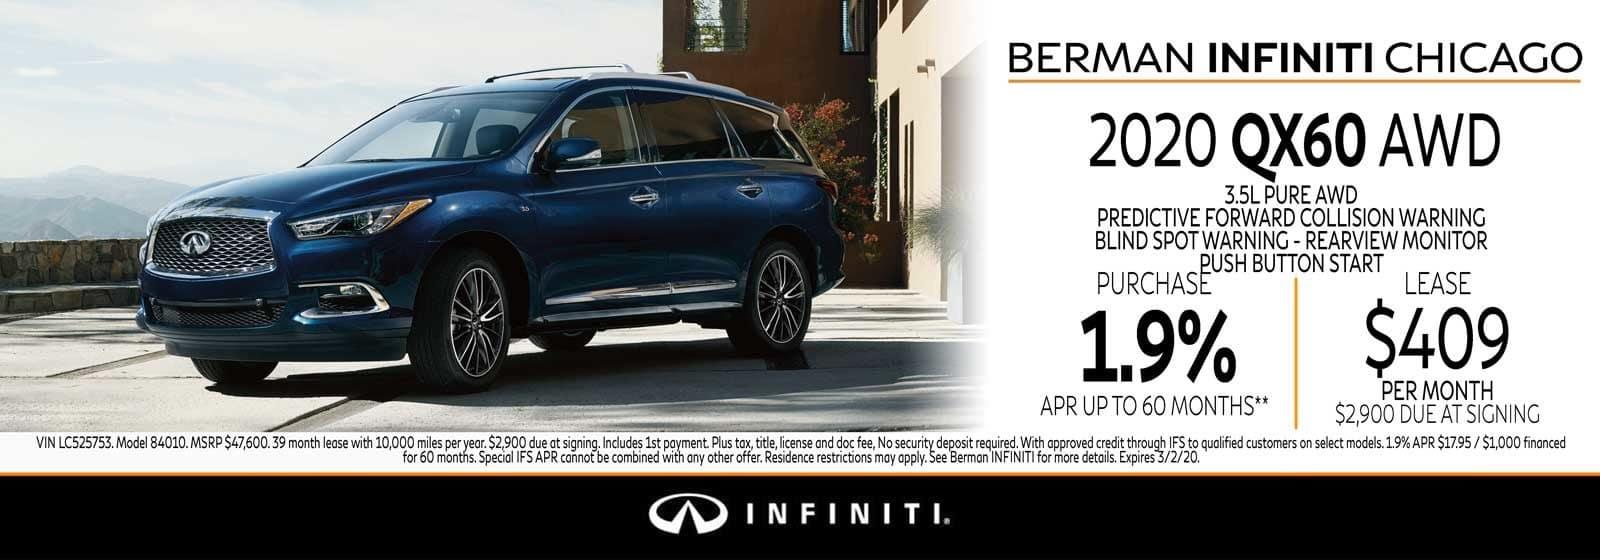 New 2020 INFINITI QX60 February offer at Berman INFINITI Chicago!